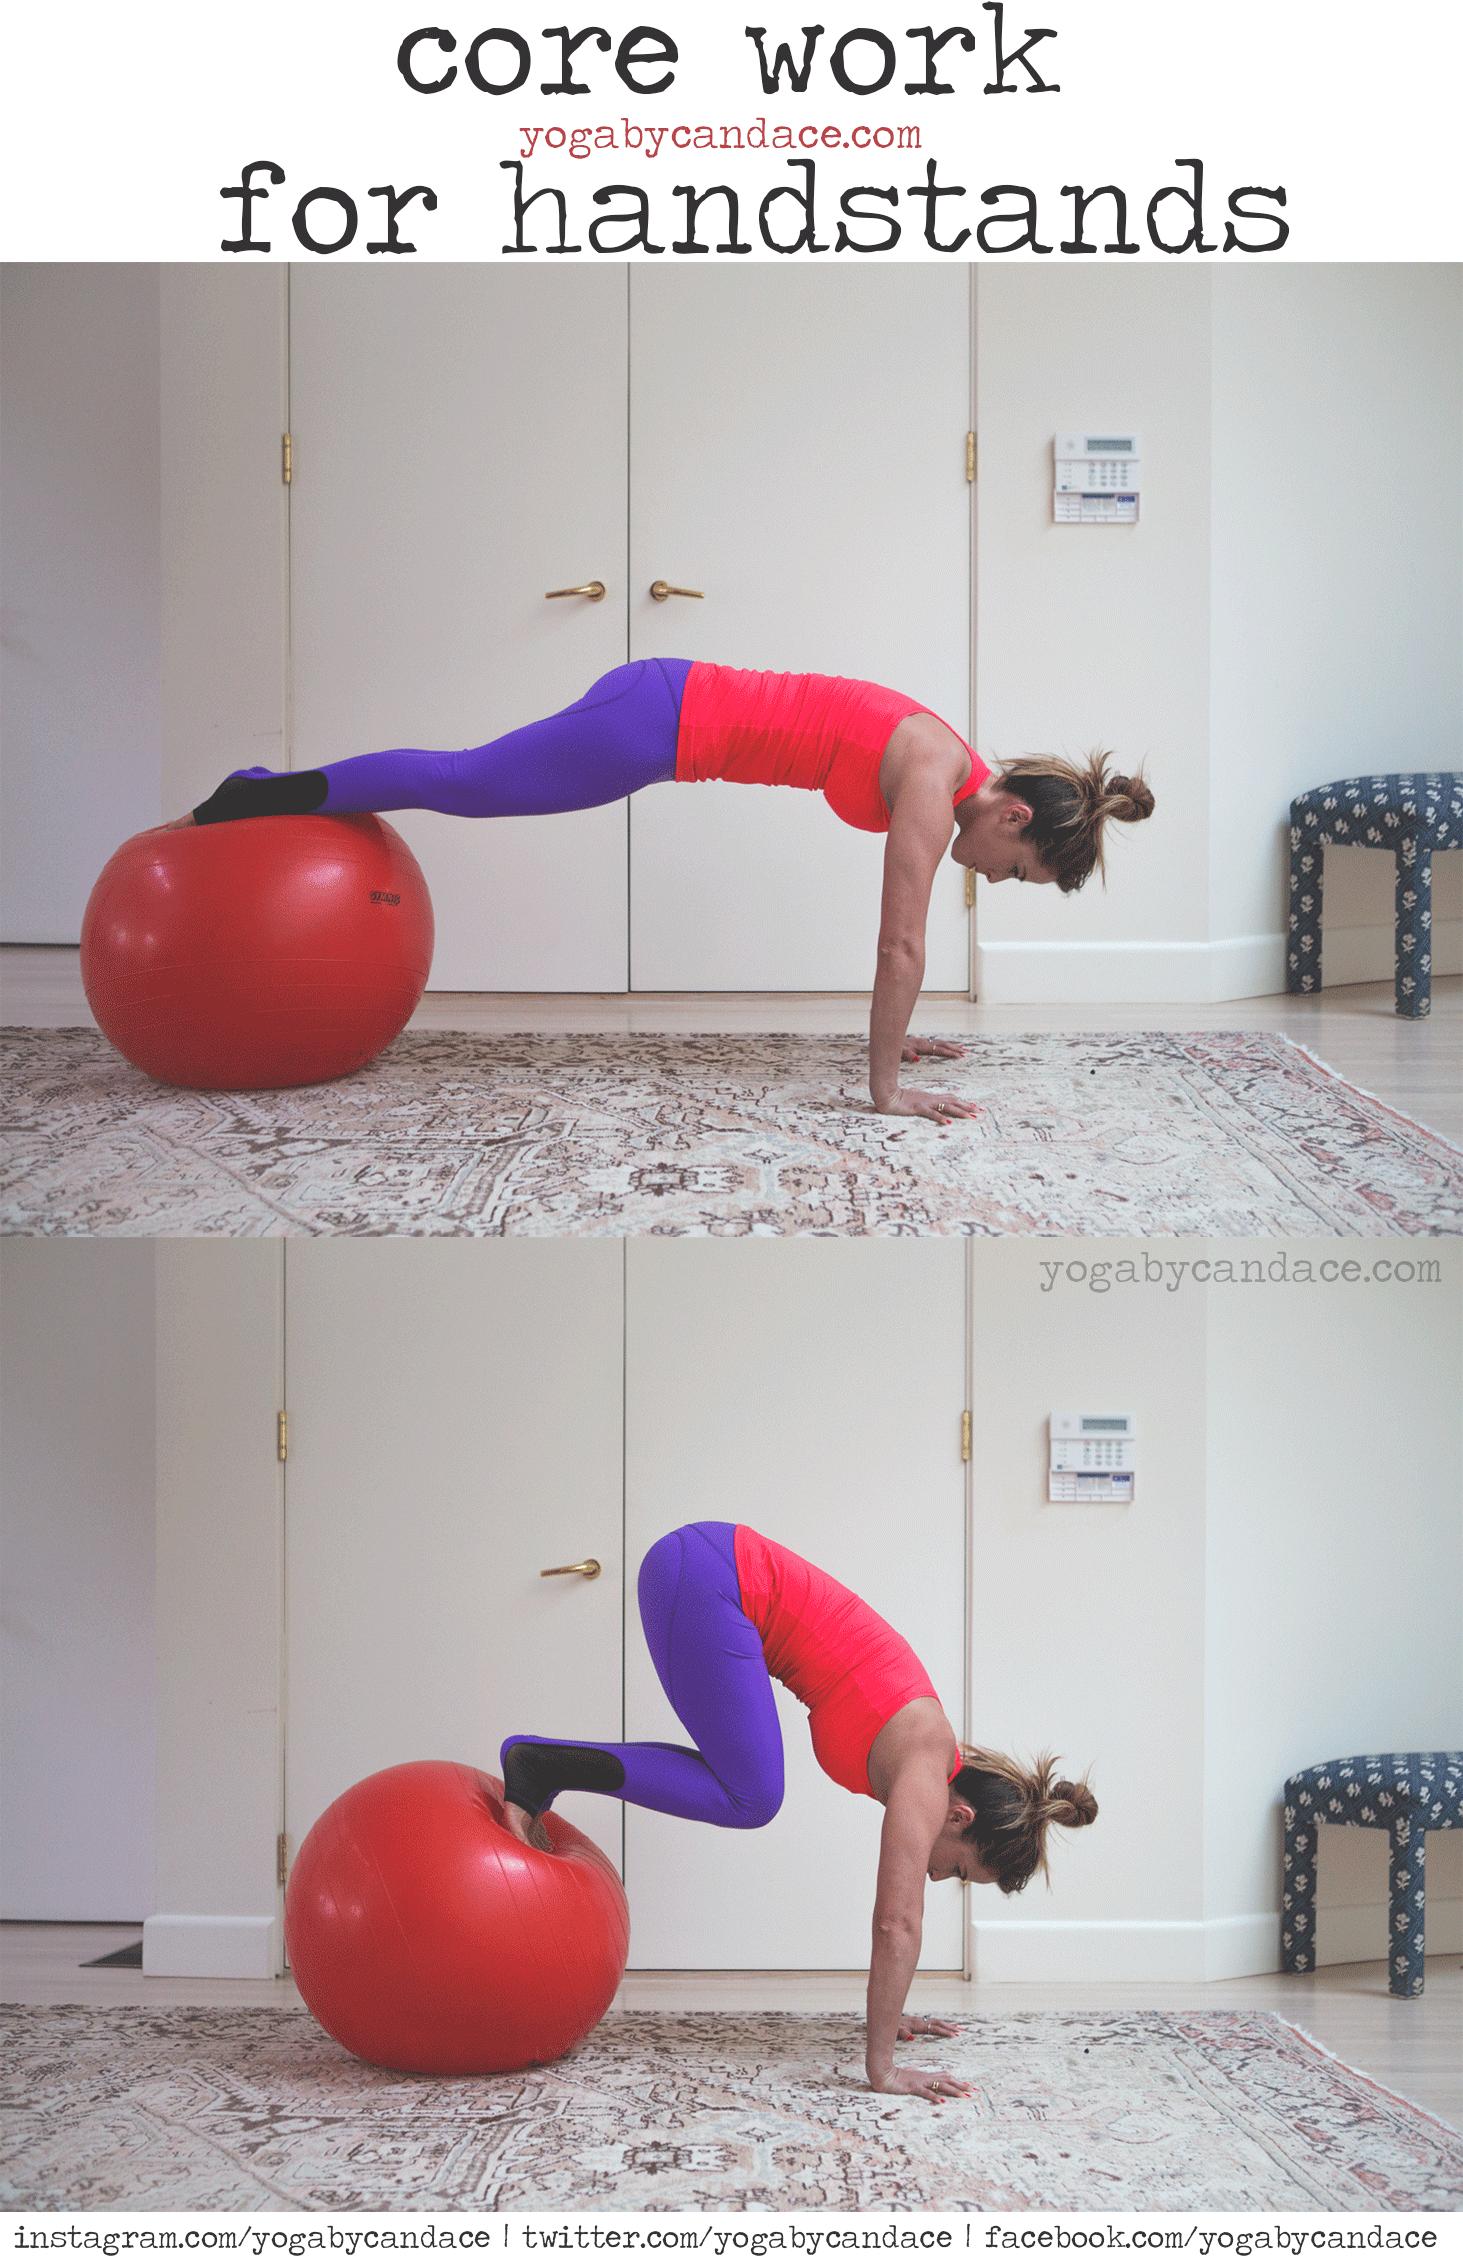 Pin now, practice core work later!  Wearing:  Nina B Roze pants , sweaty betty tank. Using:  stability ball .